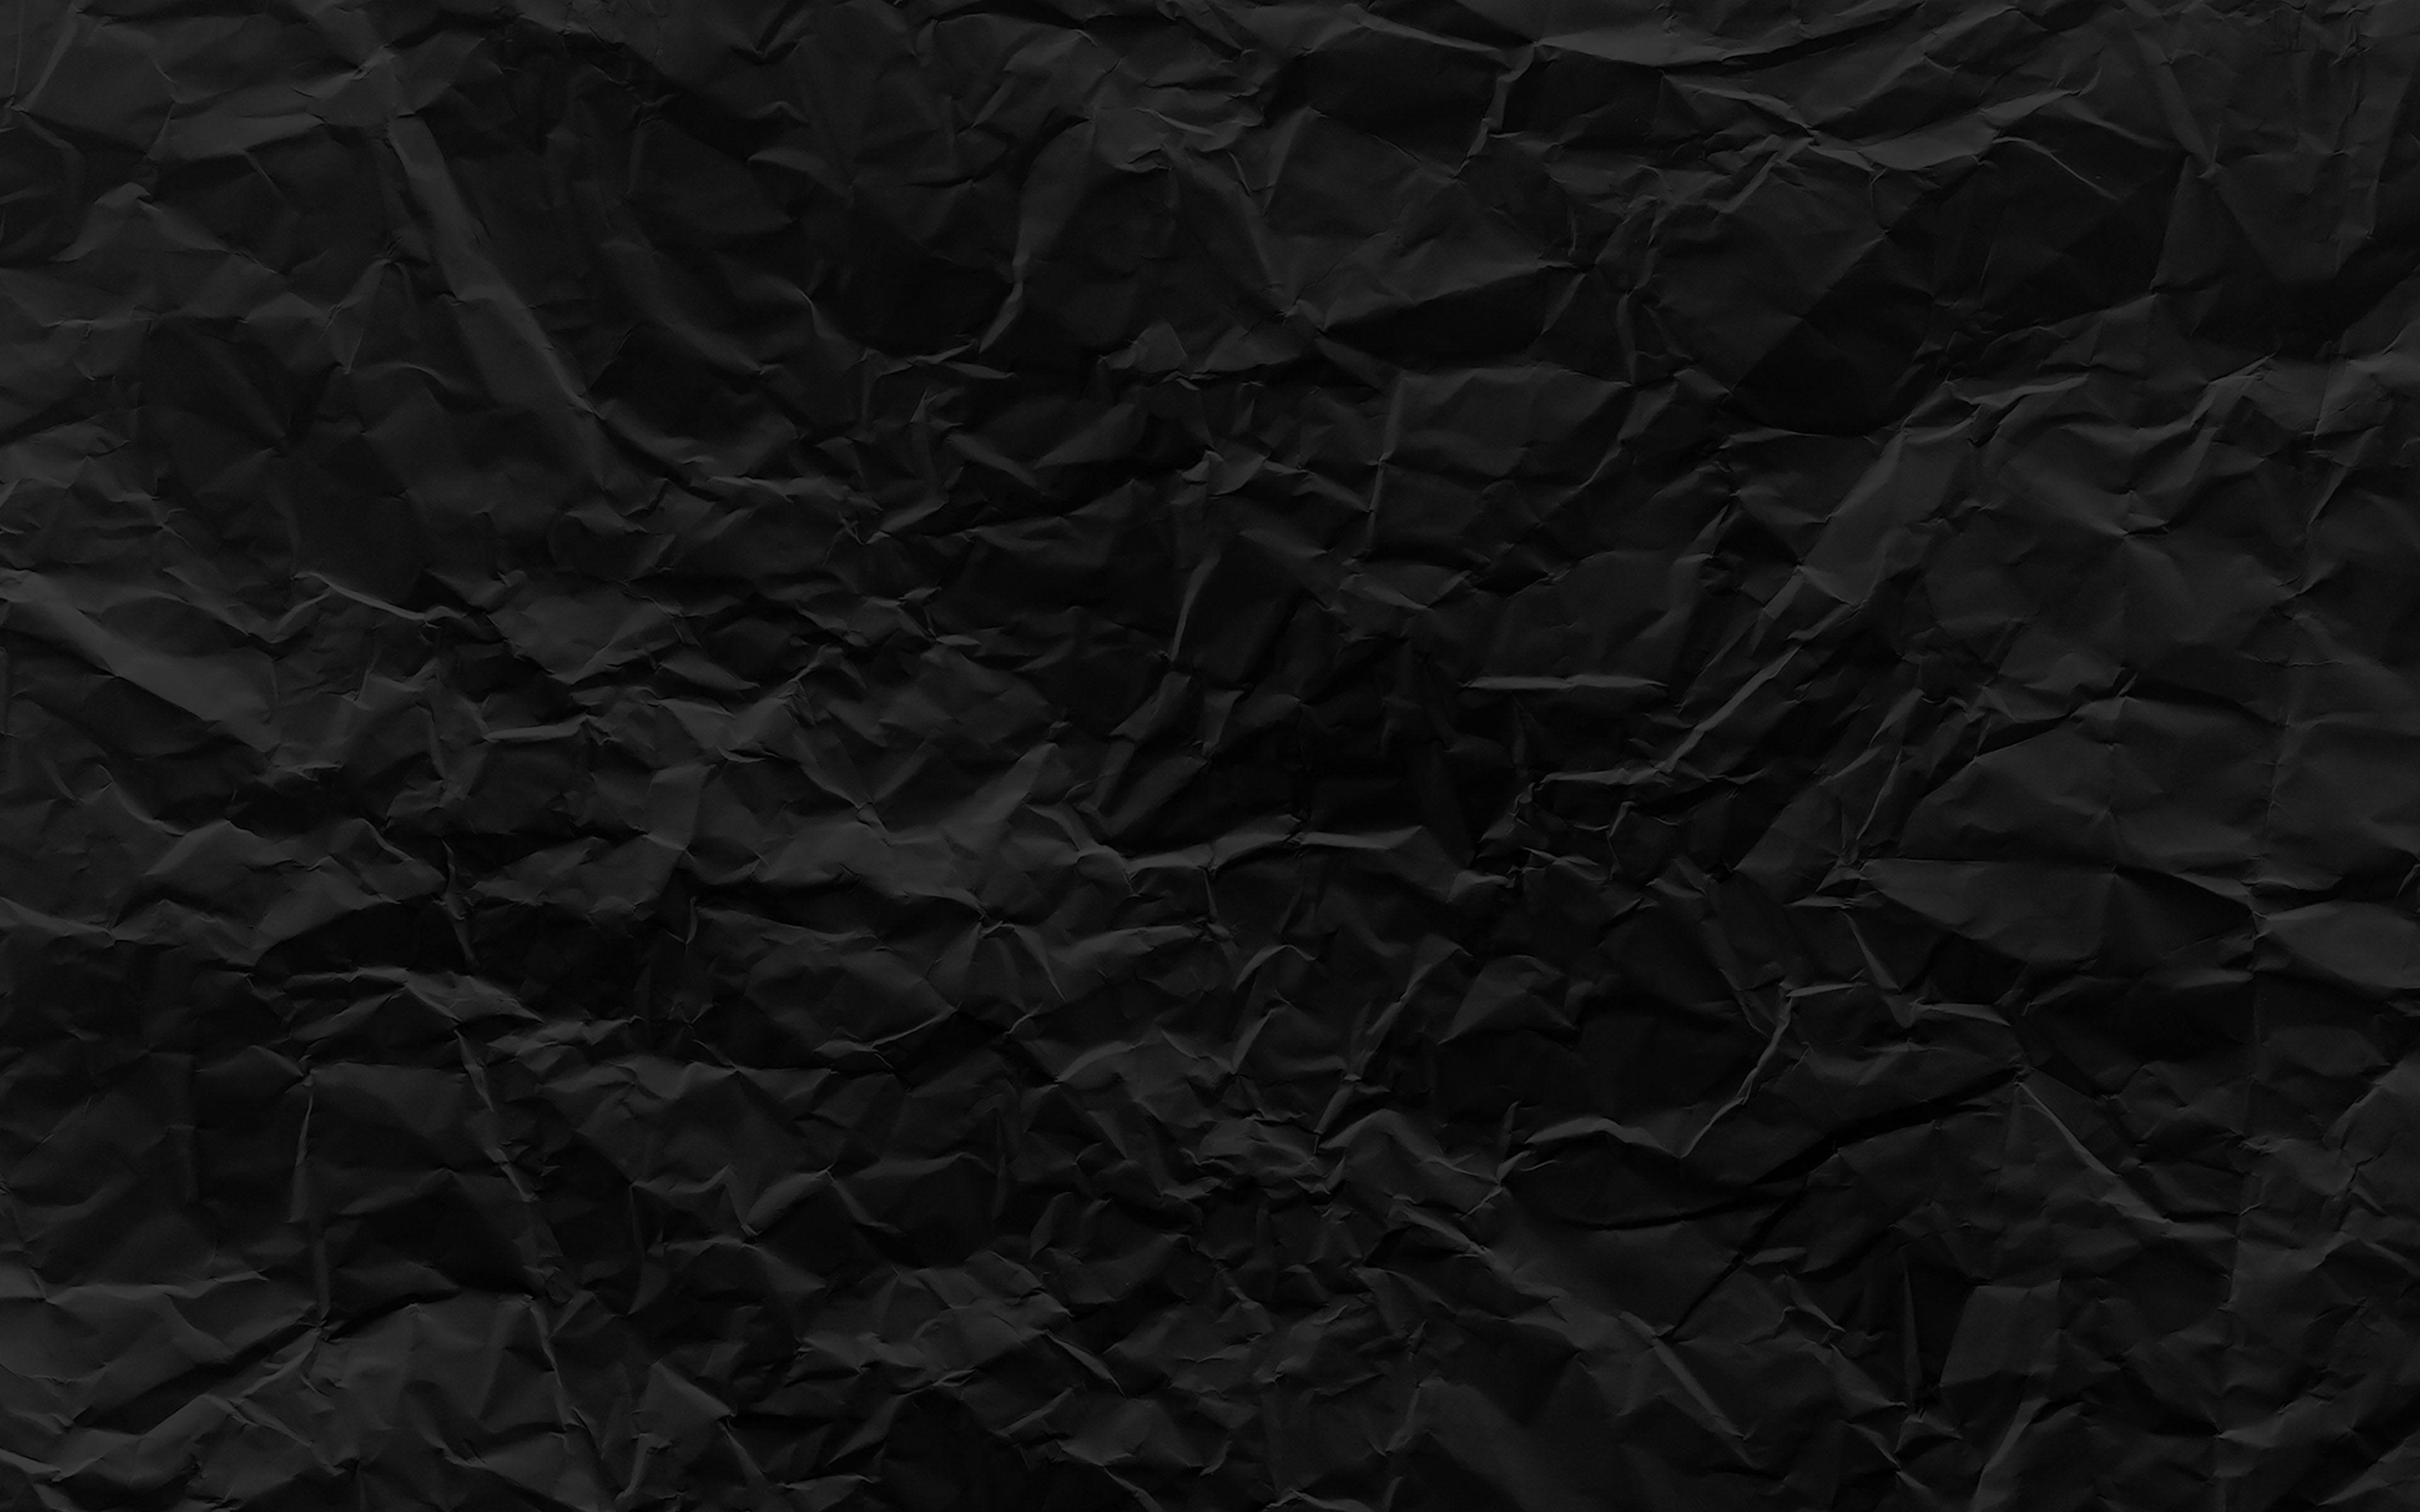 "3413x1920 Goku Anime Dark Black 4k, HD Anime, 4k Wallpapers, Images ..."">"